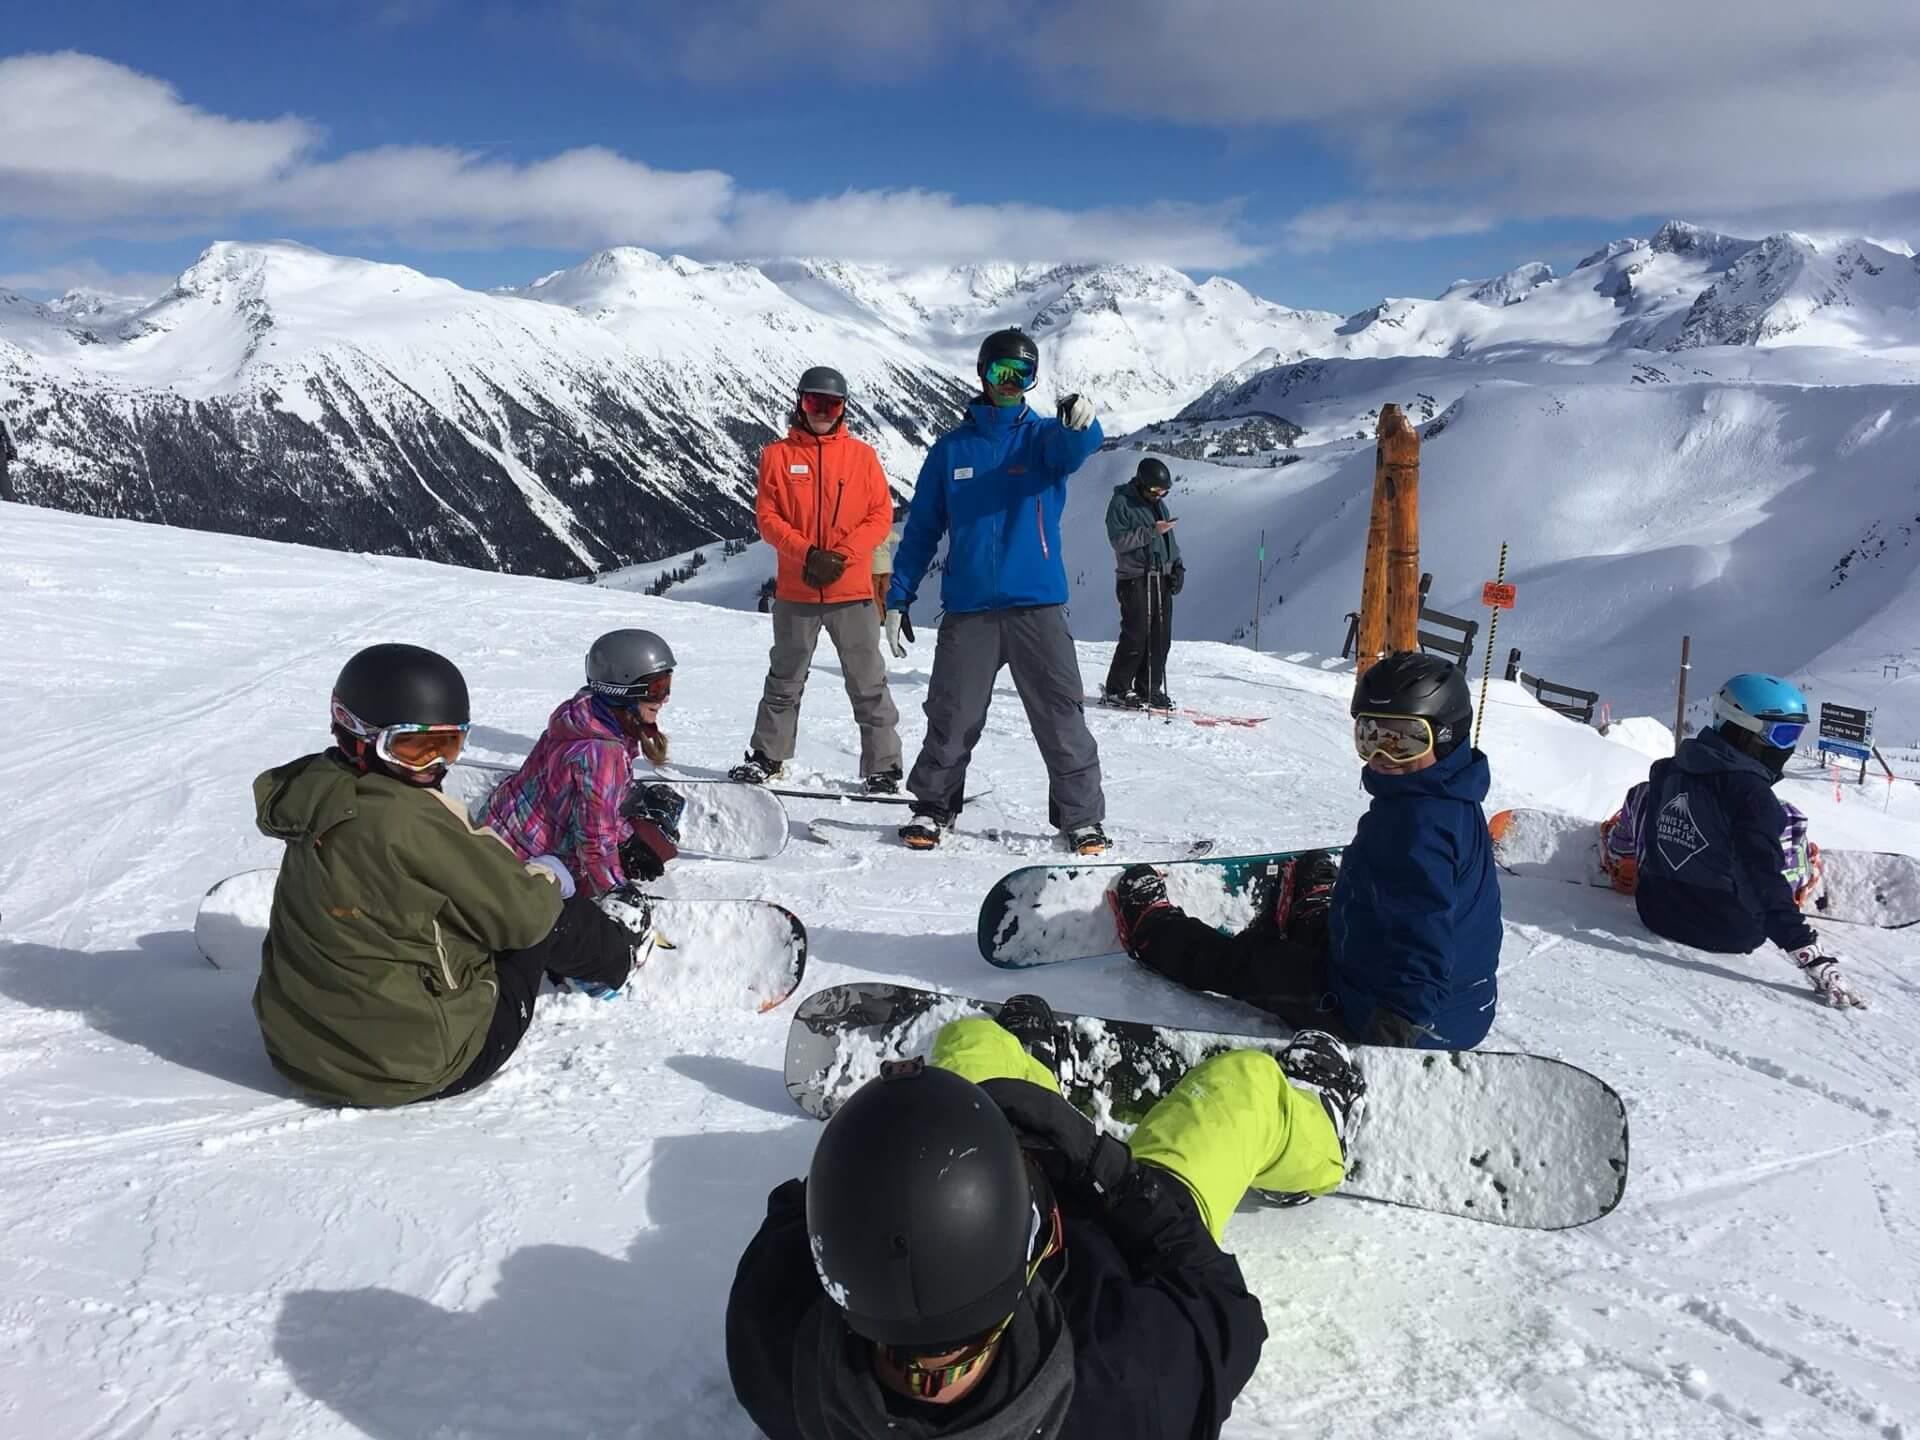 Snowboard team photo